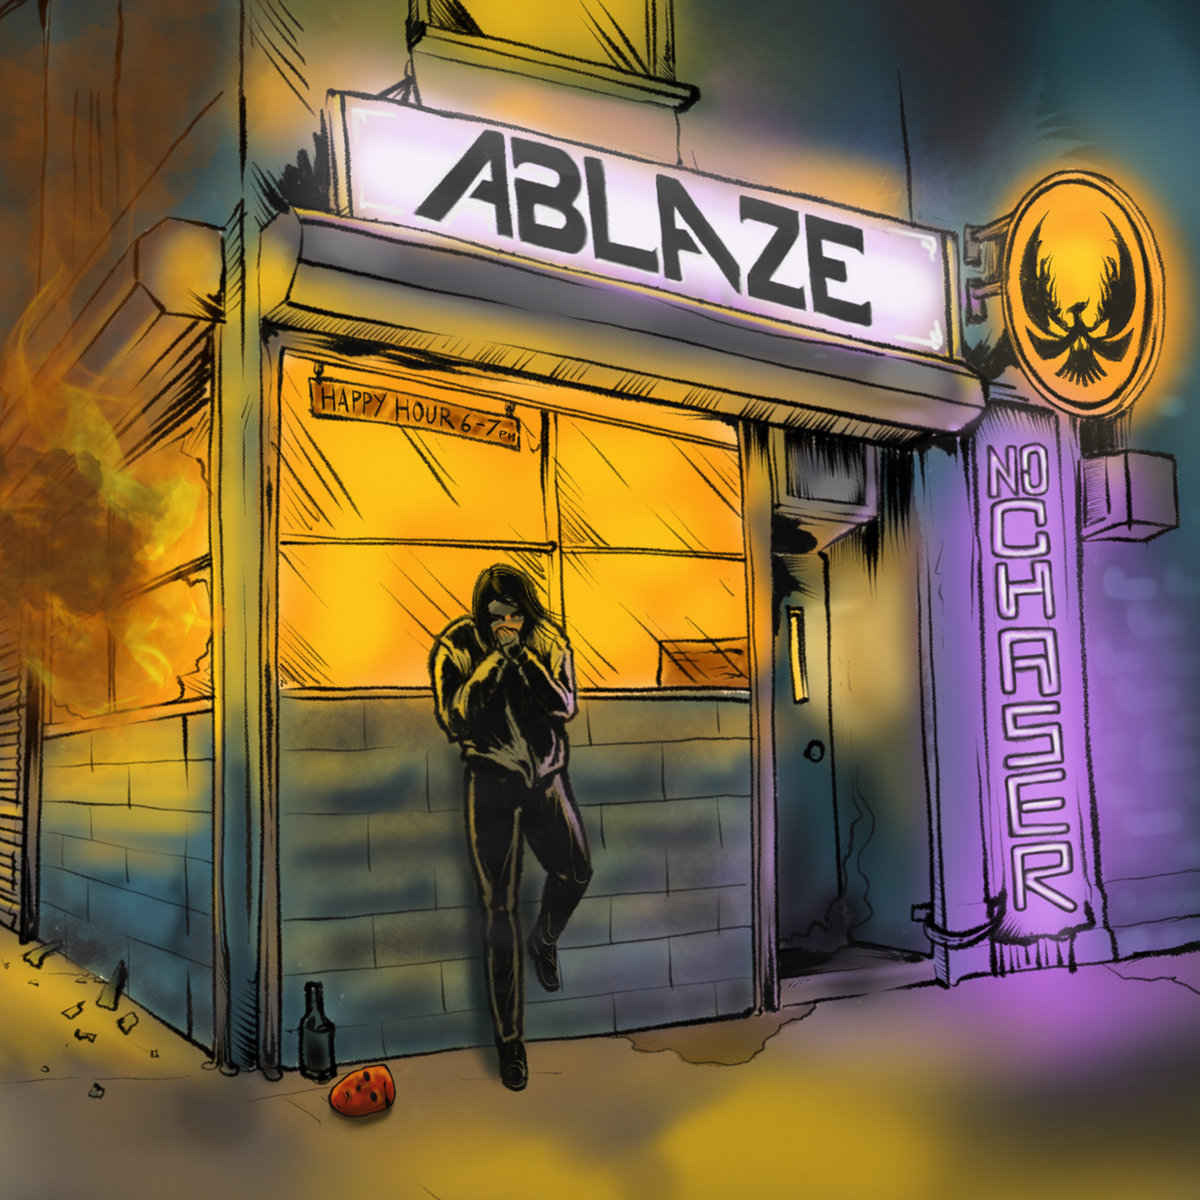 No Chaser | ABLAZE